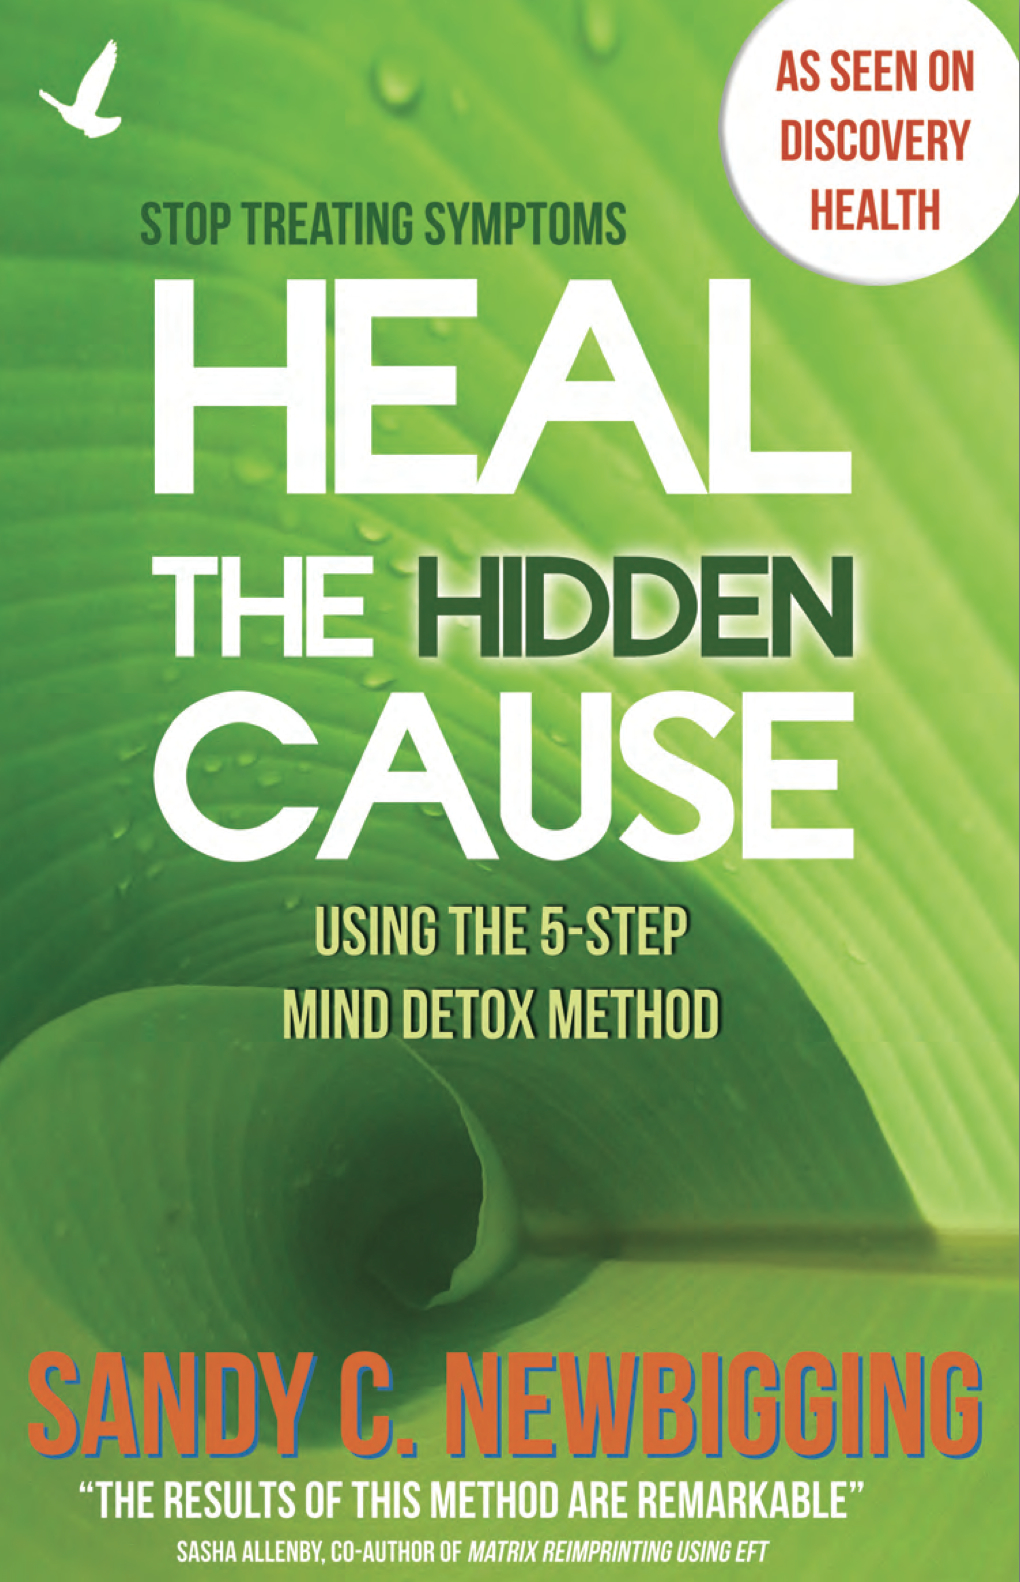 Final Heal the Hidden Cause Front Cover 2013.jpg